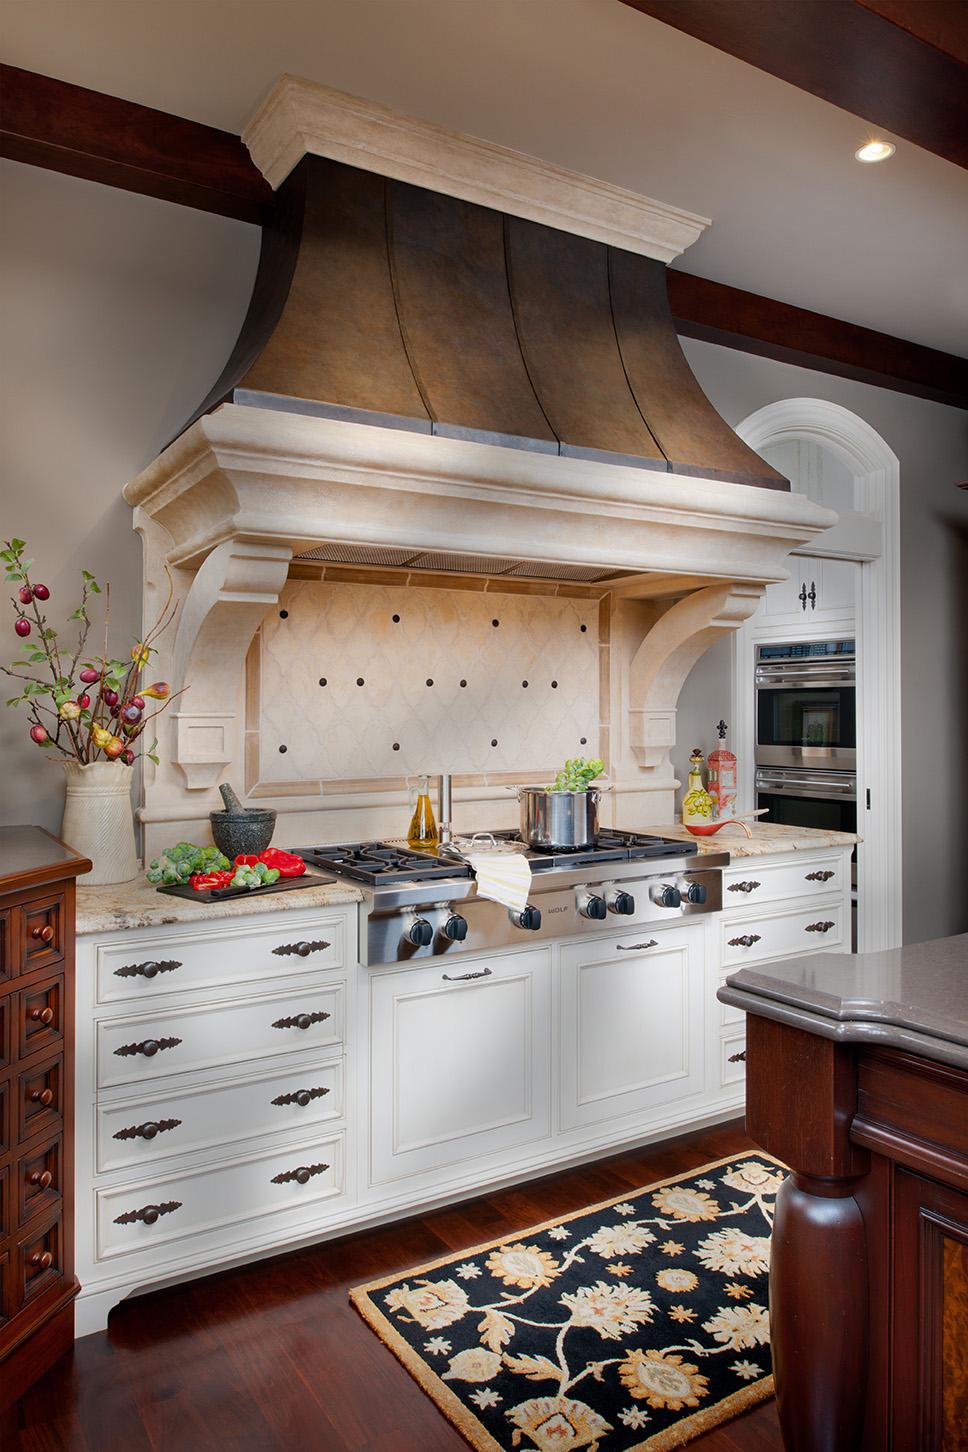 kitchen_bath_concepts_wholehome7_12.jpg